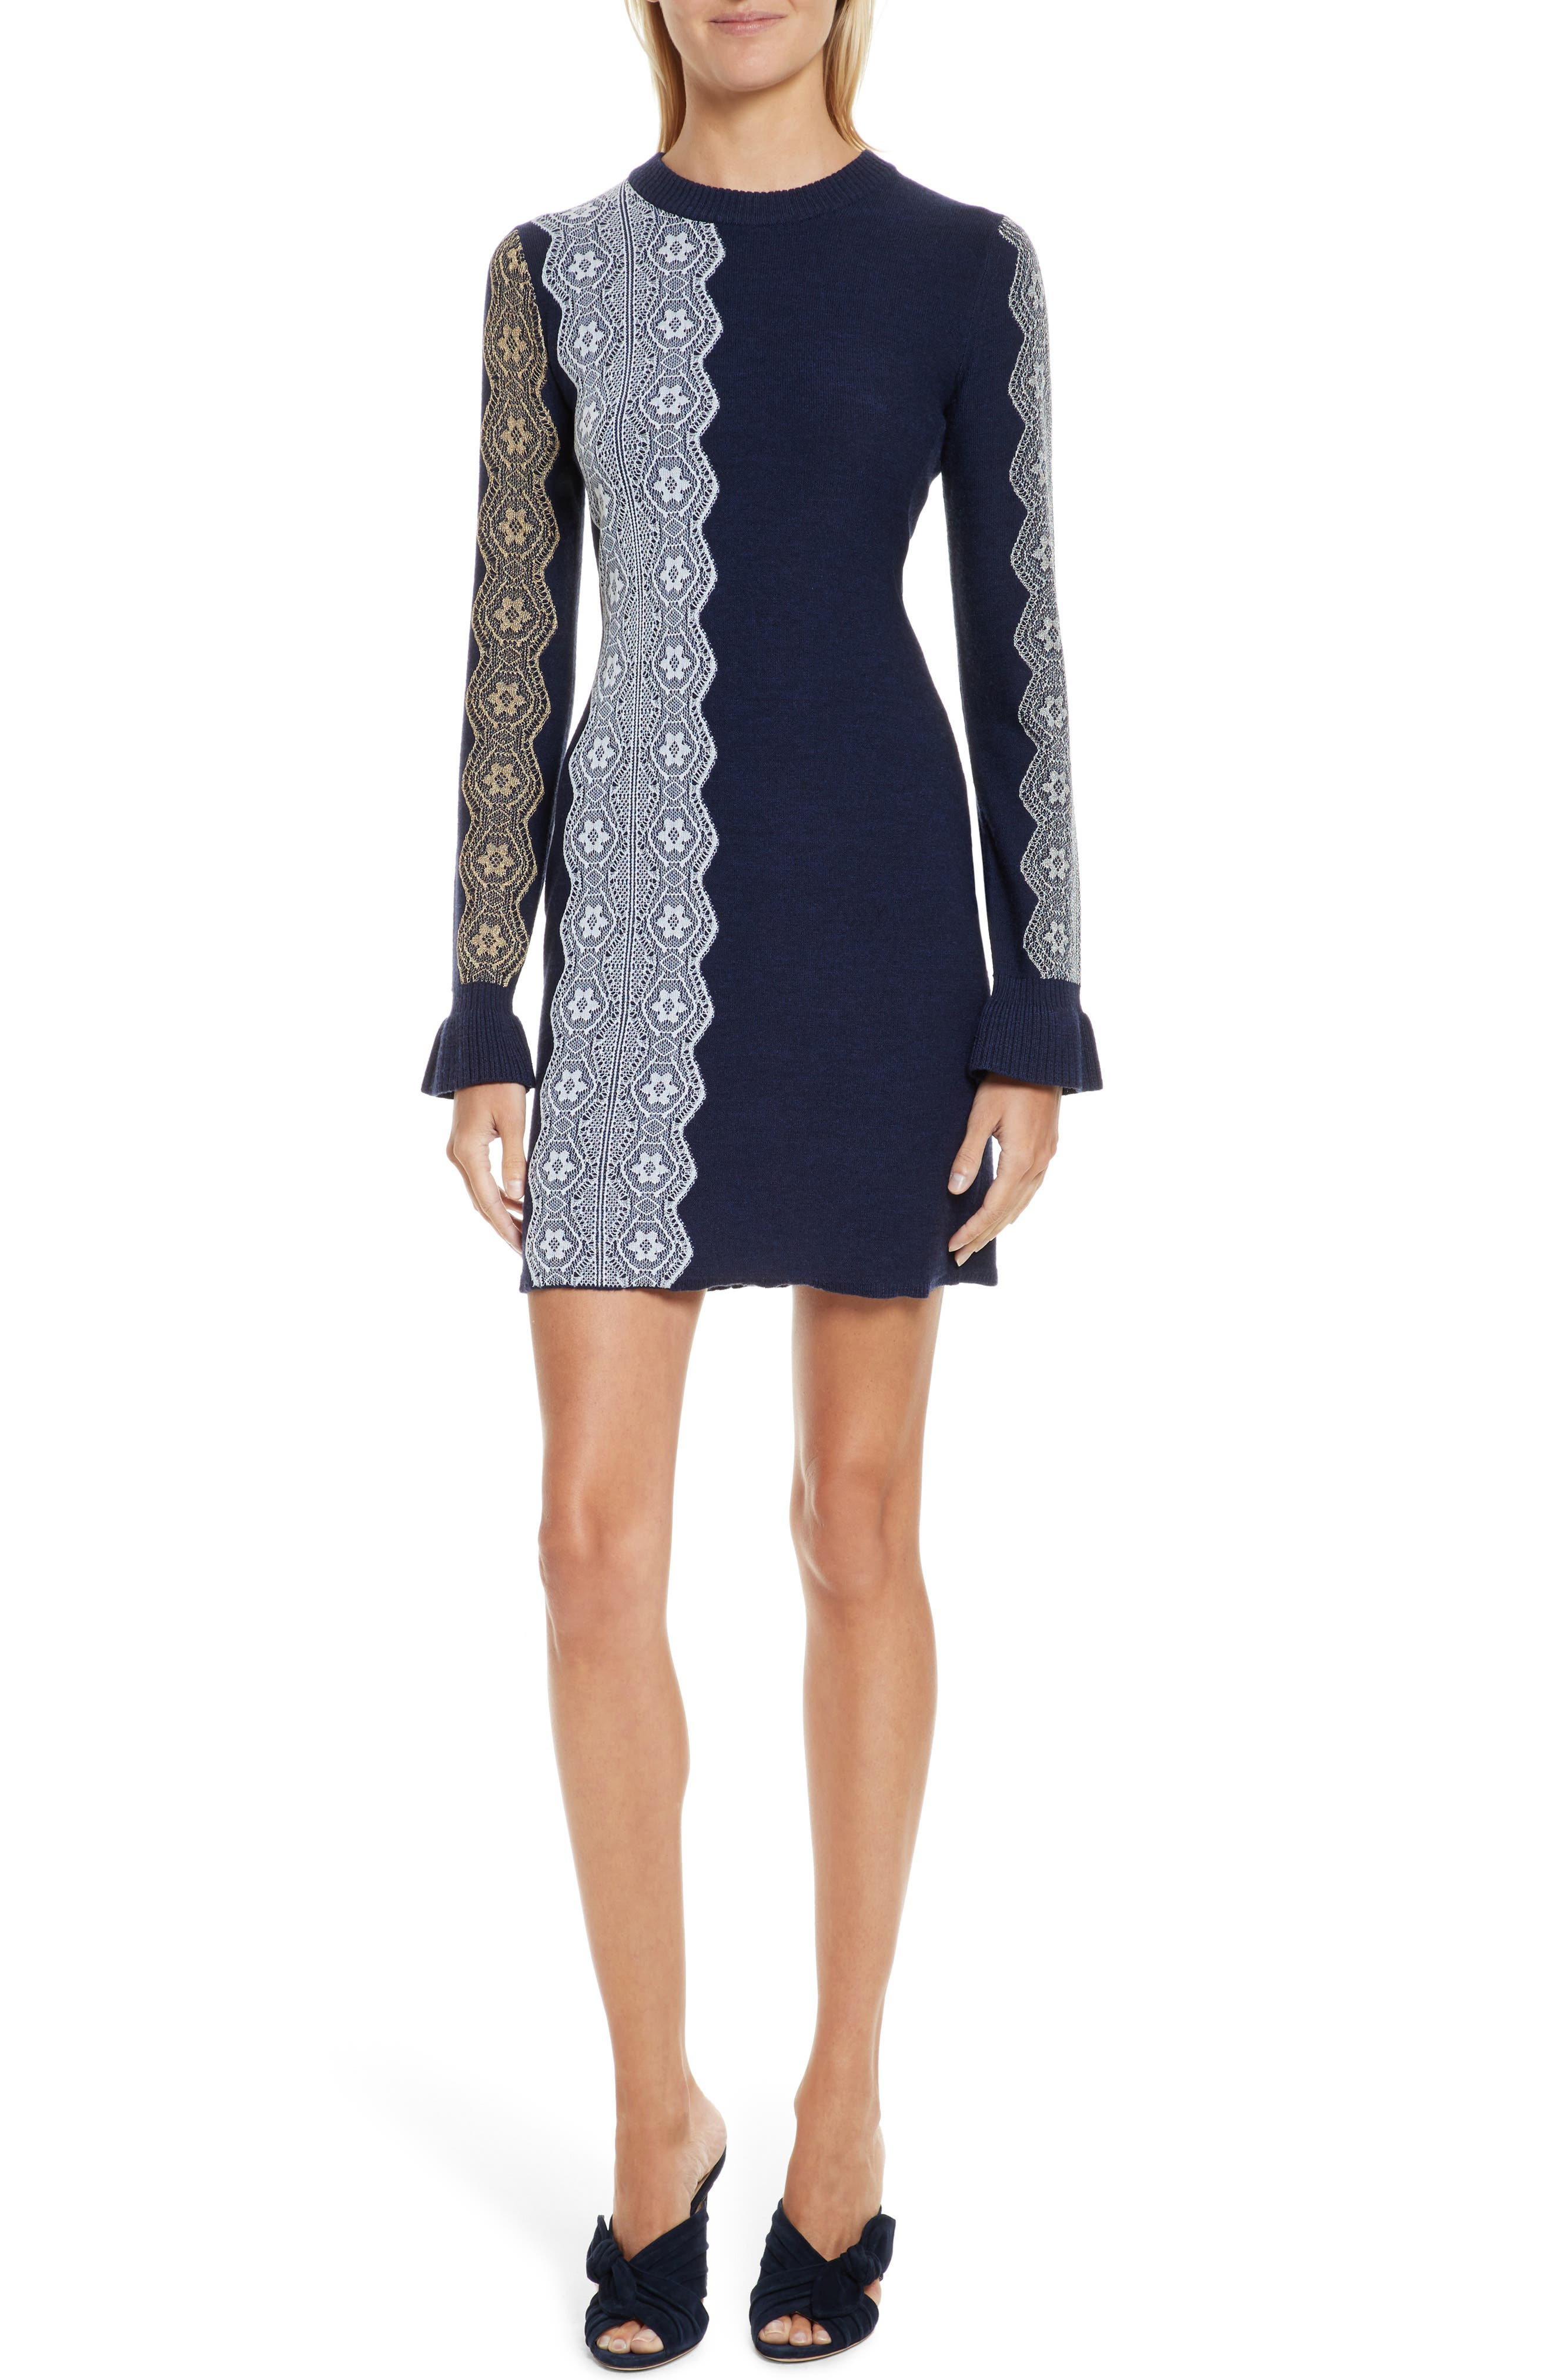 Alternate Image 1 Selected - 3.1 Phillip Lim Intarsia Lace Wool Blend Dress